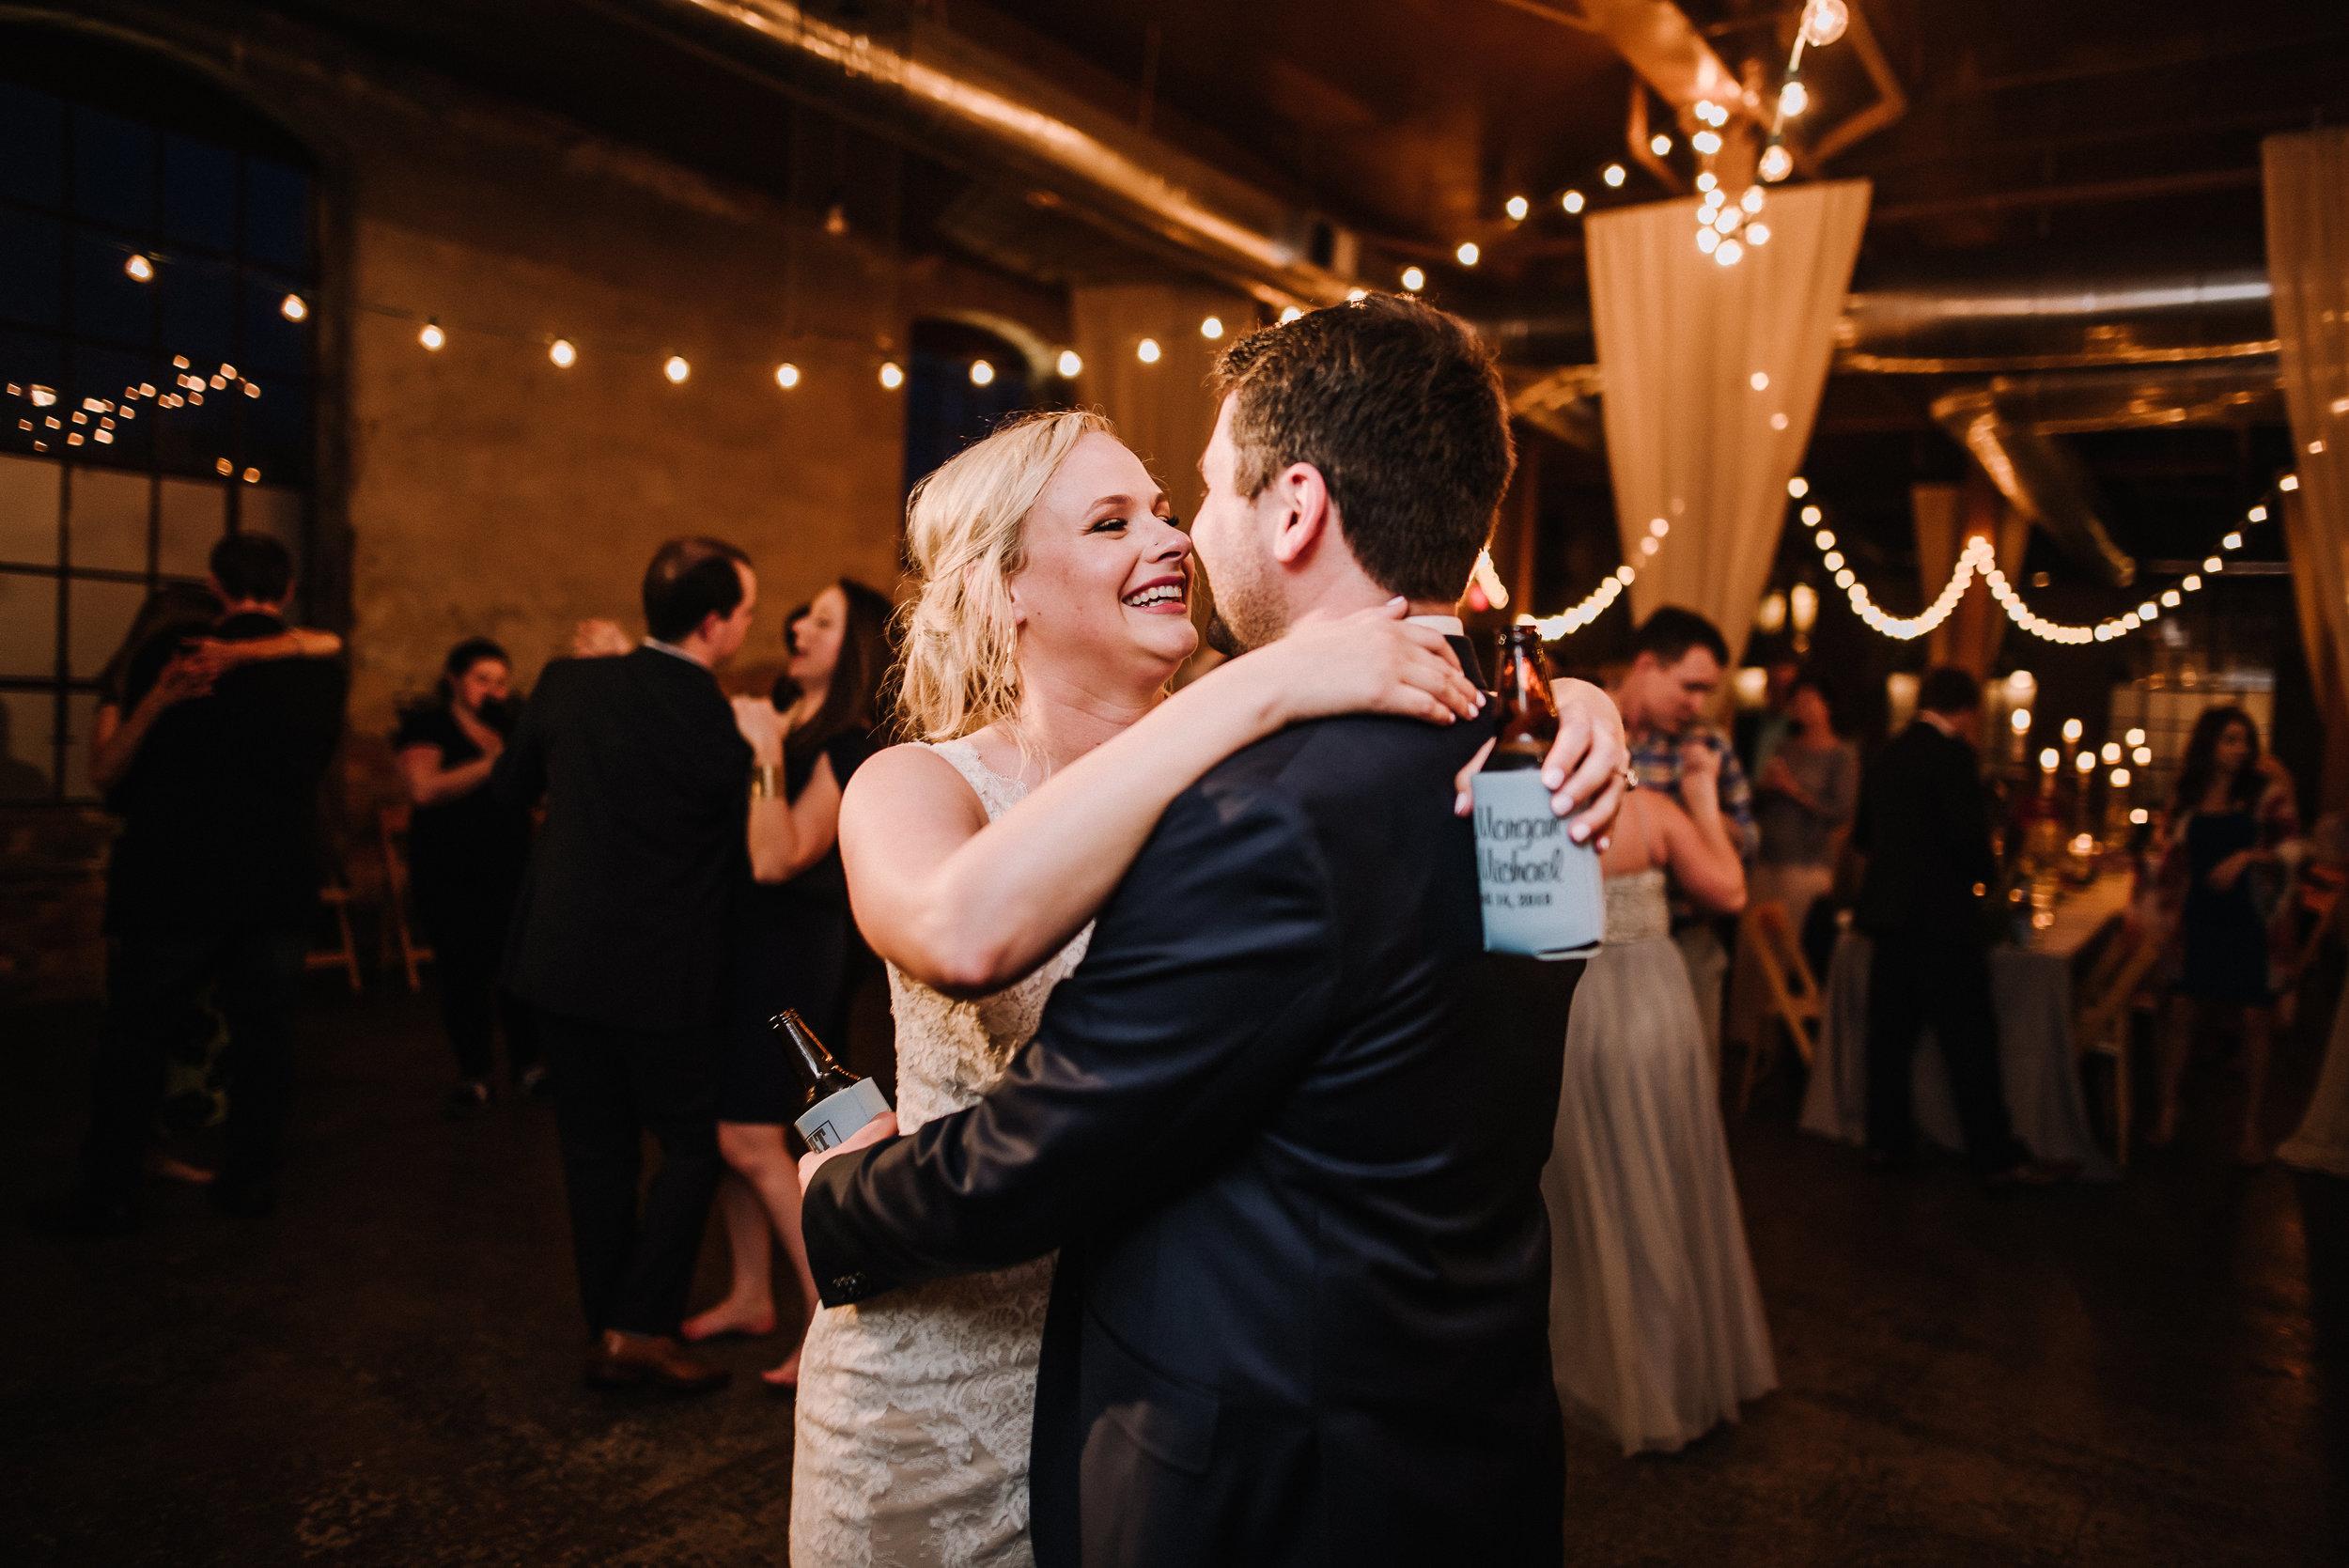 Morgan Wedding_Mill at Yellow River_Ashley Benham Photography-1159.jpg